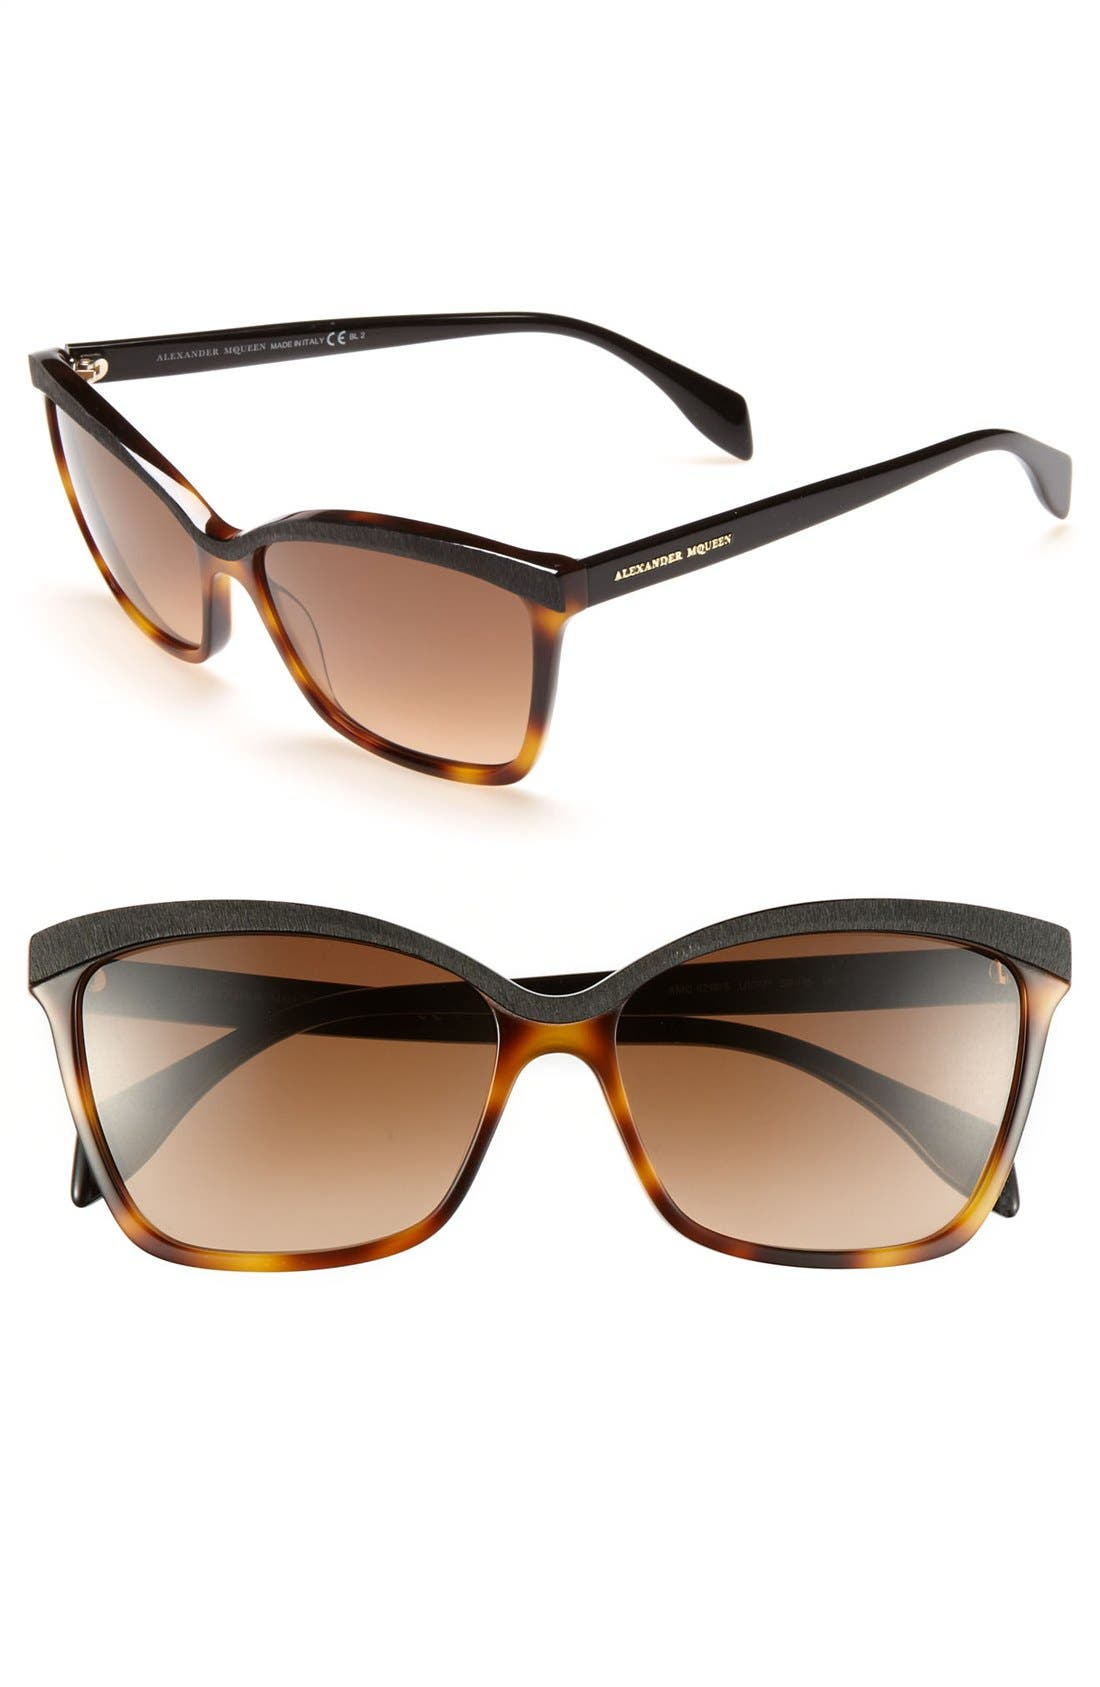 Main Image - Alexander McQueen 58mm 'Retro' Sunglasses